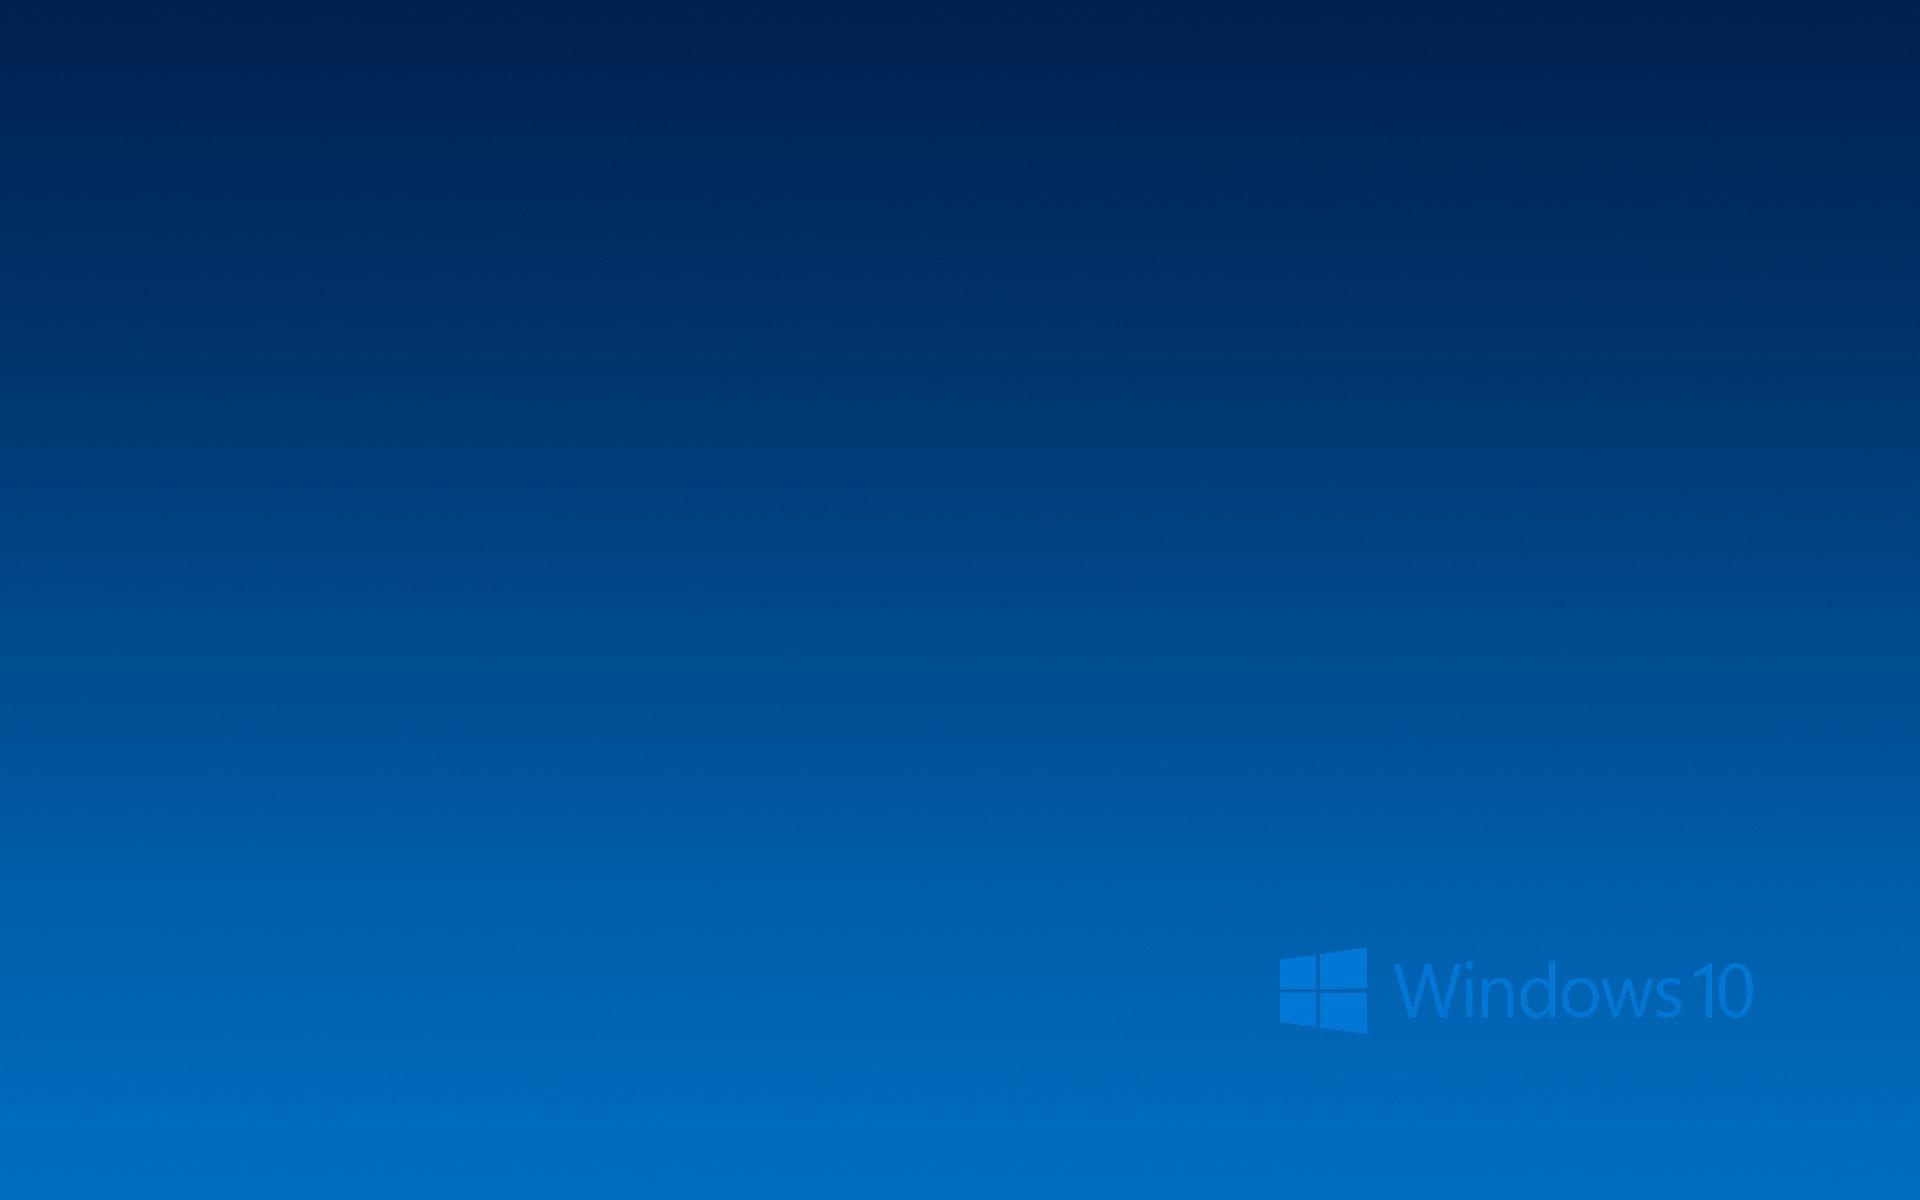 Wallpaper Unicorn Windows Free 10 Desktop